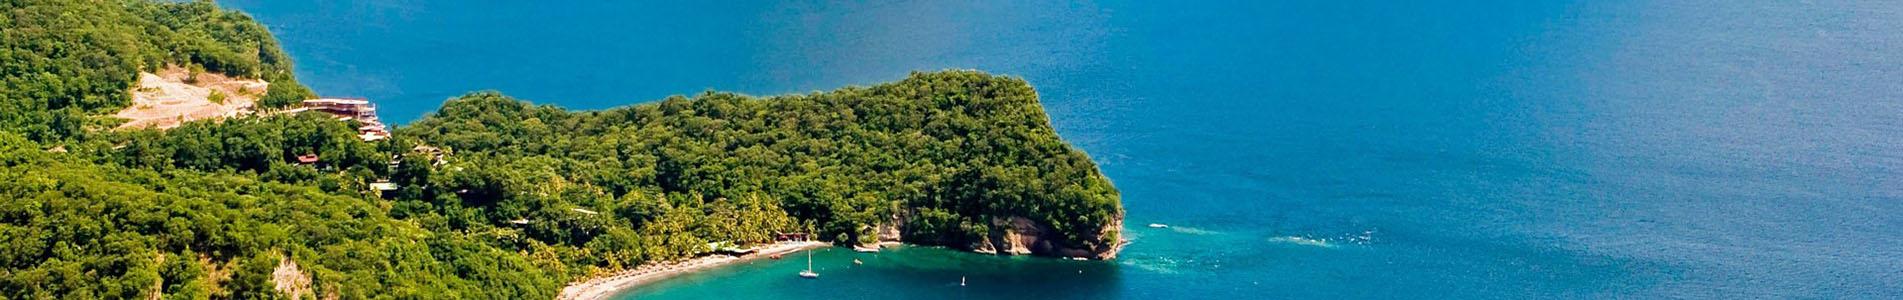 Charter de Superyacht Caribe